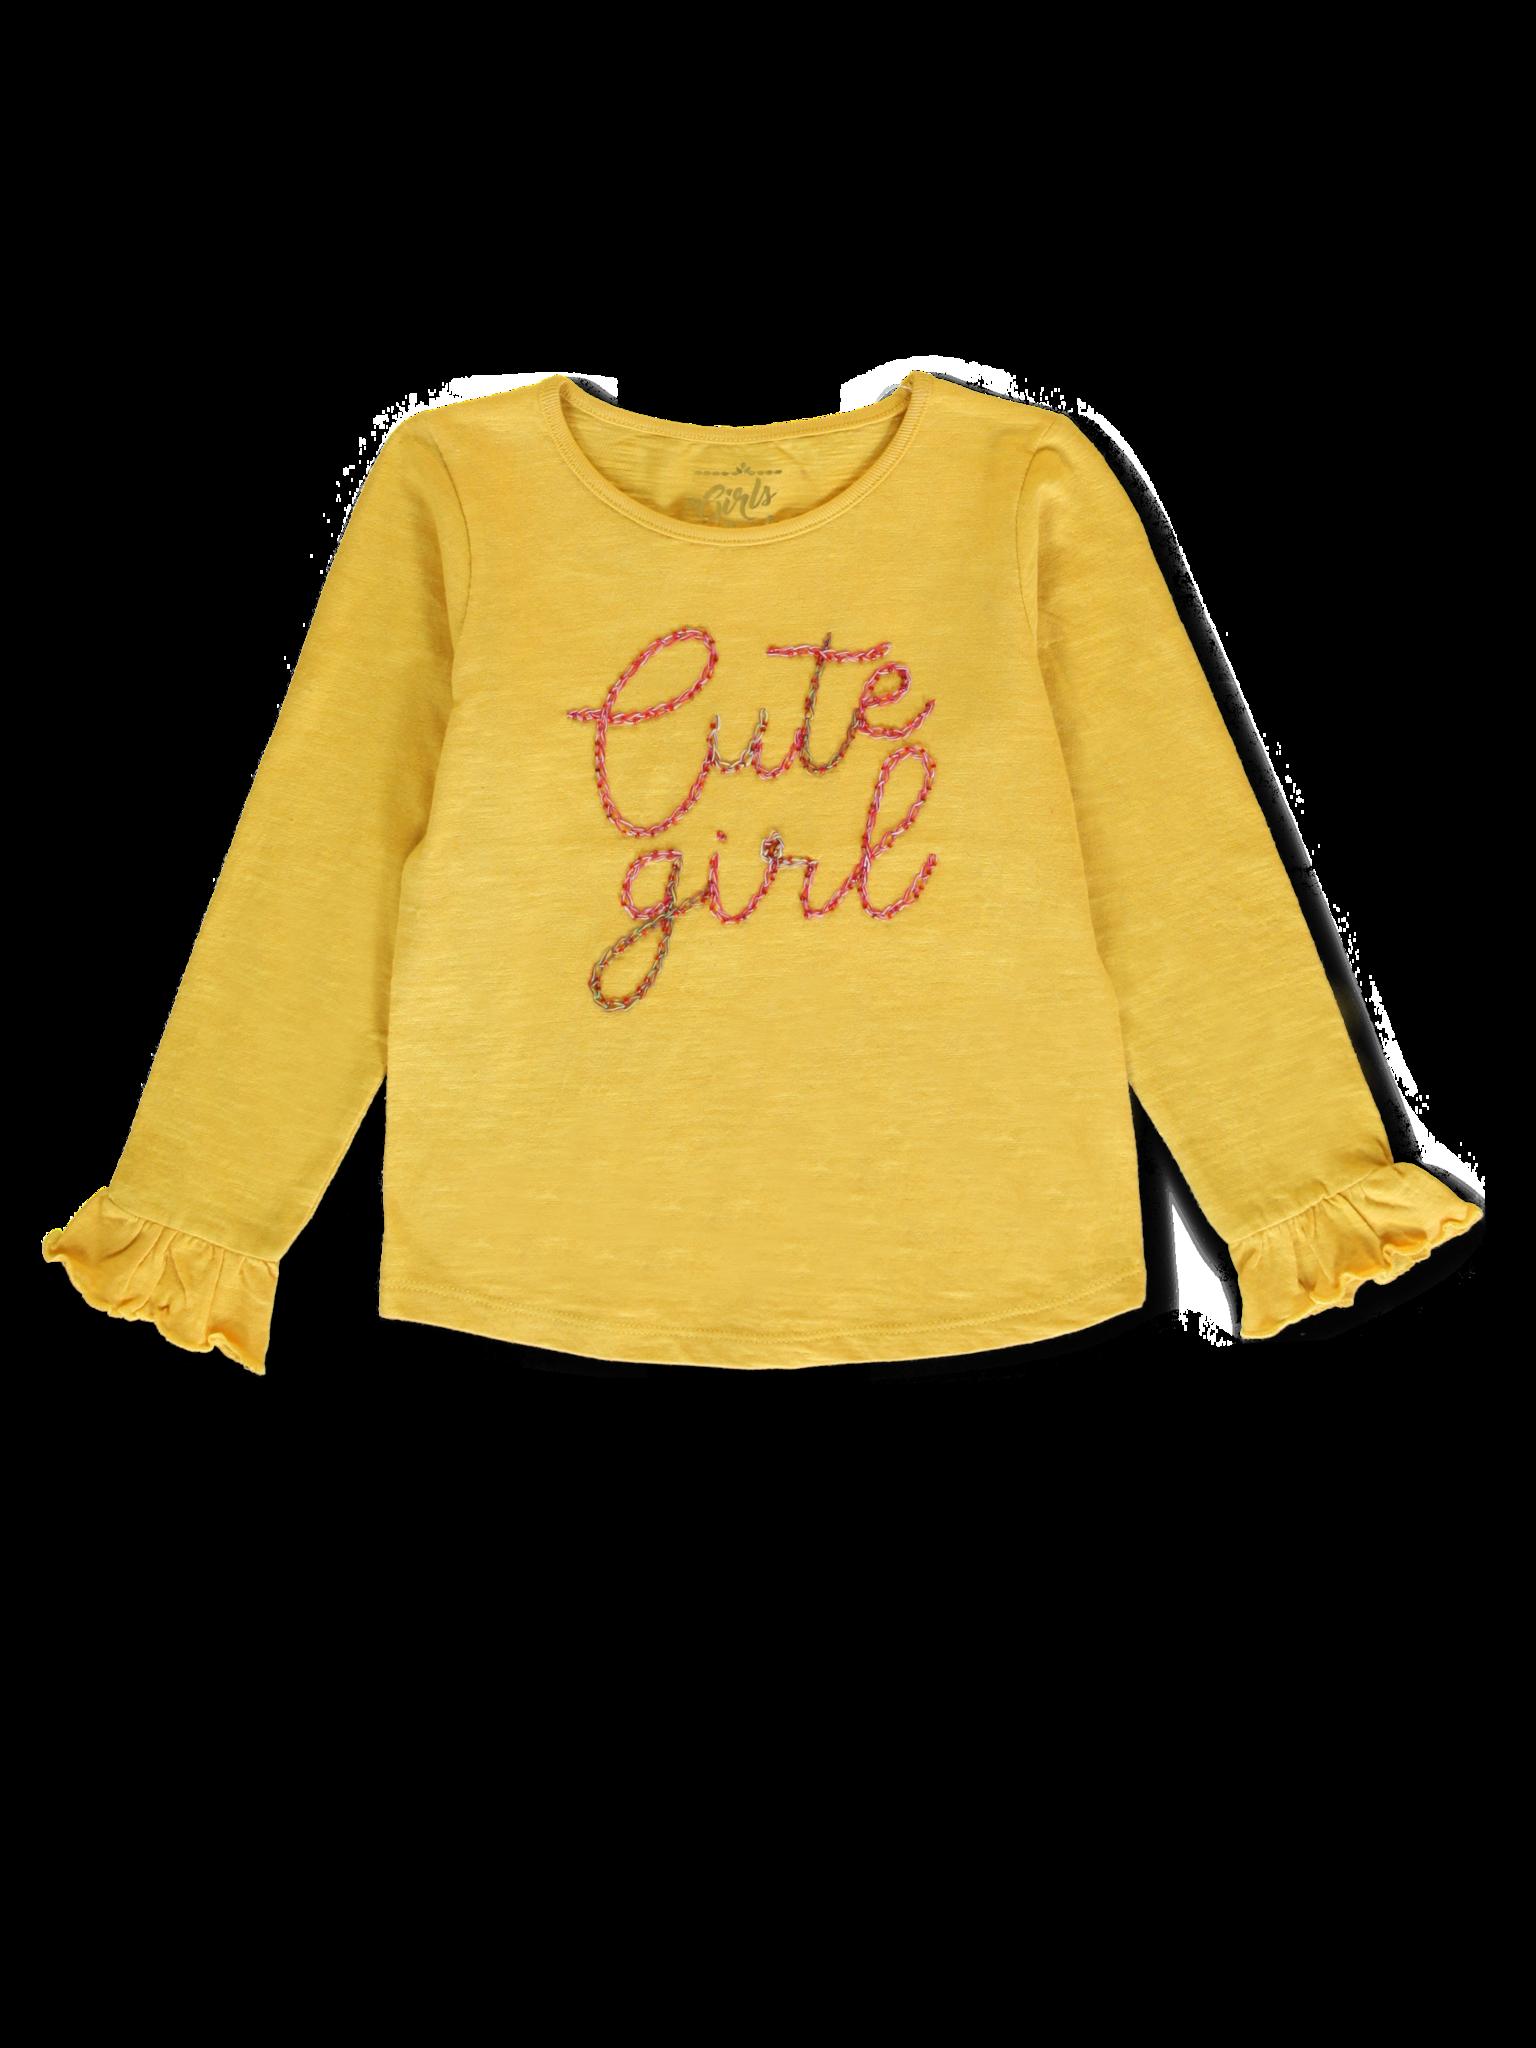 Lemon Beret | Winter 2019 Small Girls | T-shirt | 12 pcs/box